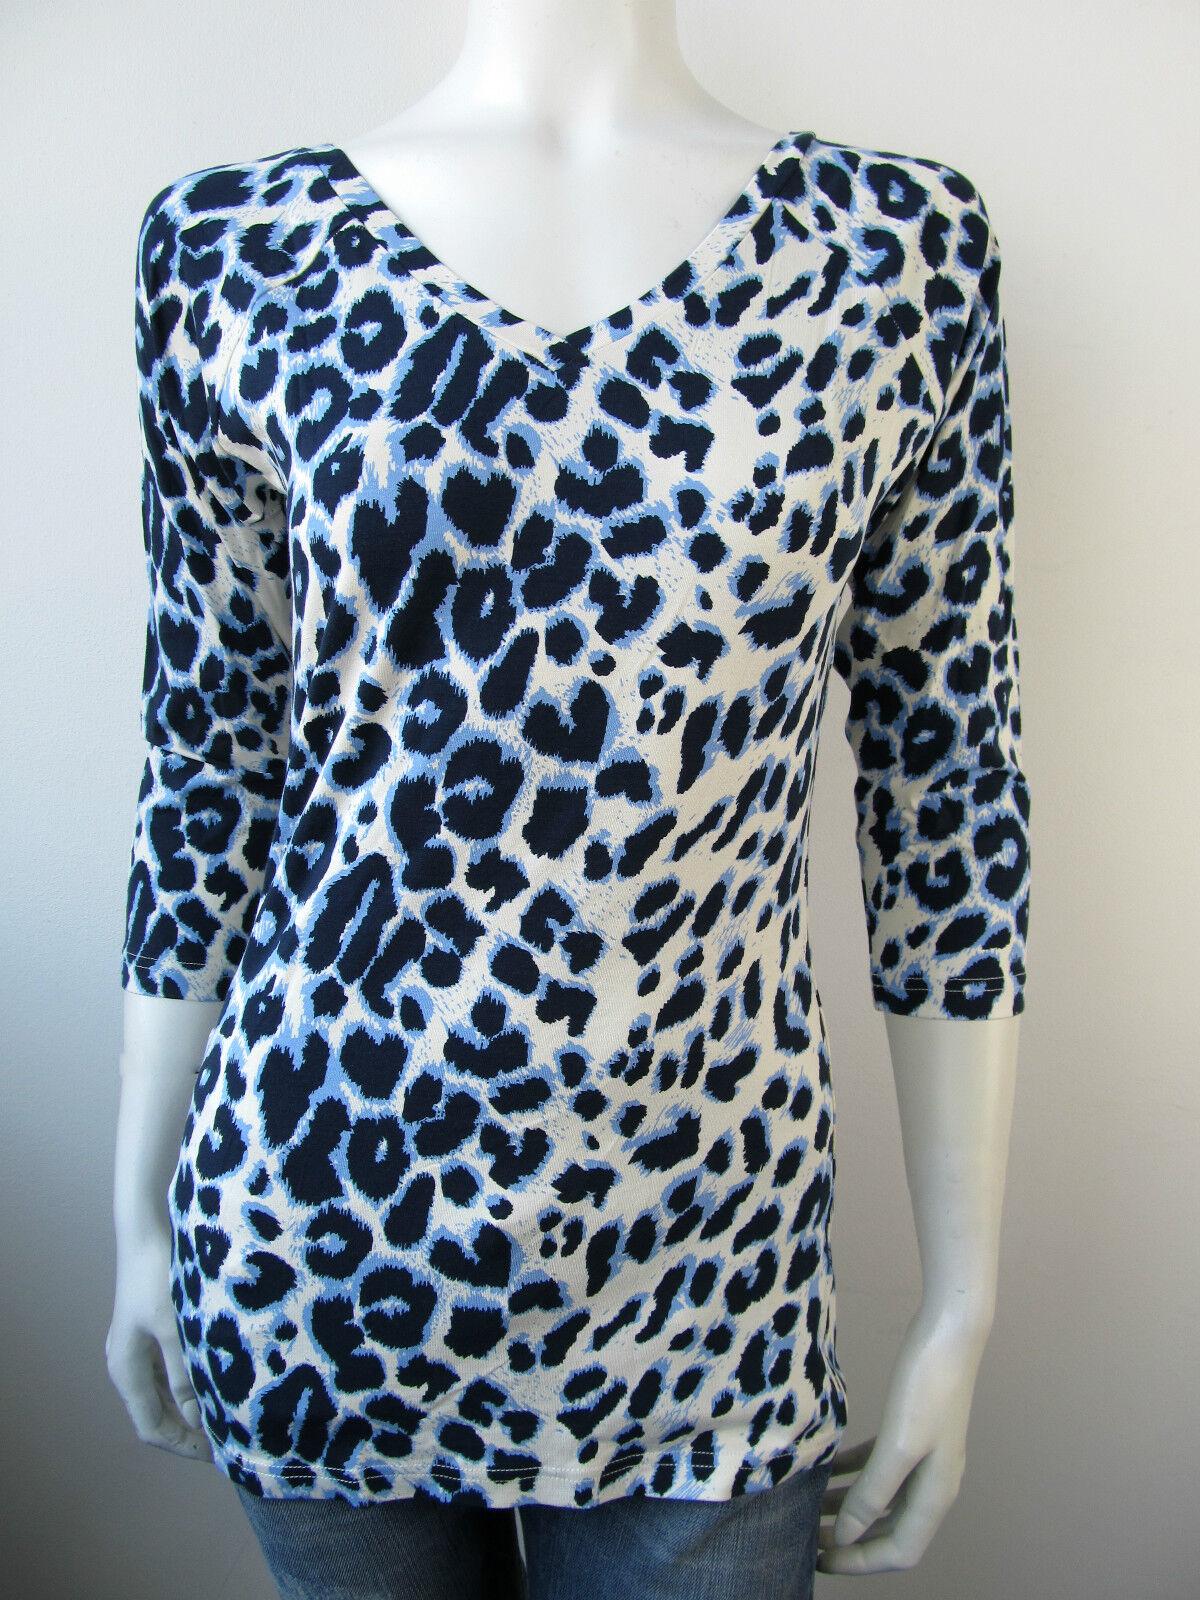 Juffrouw JANSEN T-shirt tee shirt top Animal Motif Panther 164 010 730 NEUF L XL